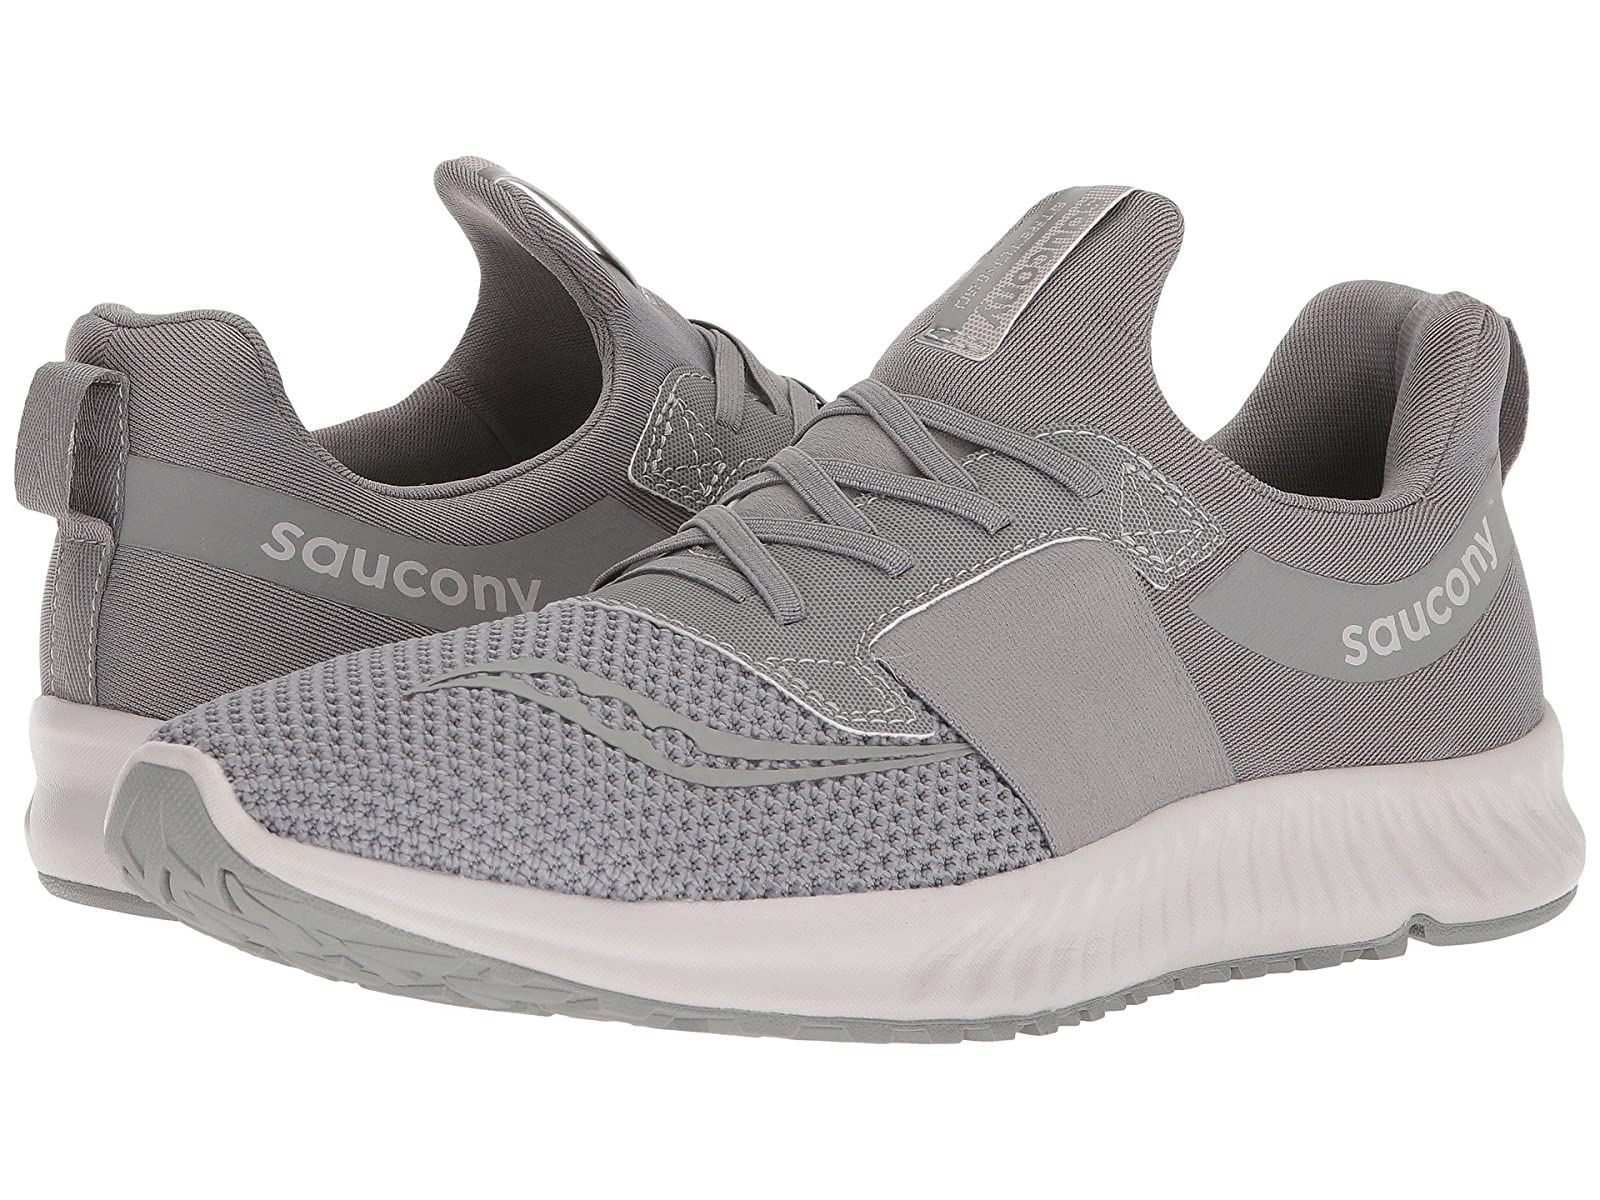 Saucony Stretch & Go BreezeAtmospheric grades have affordable shoes